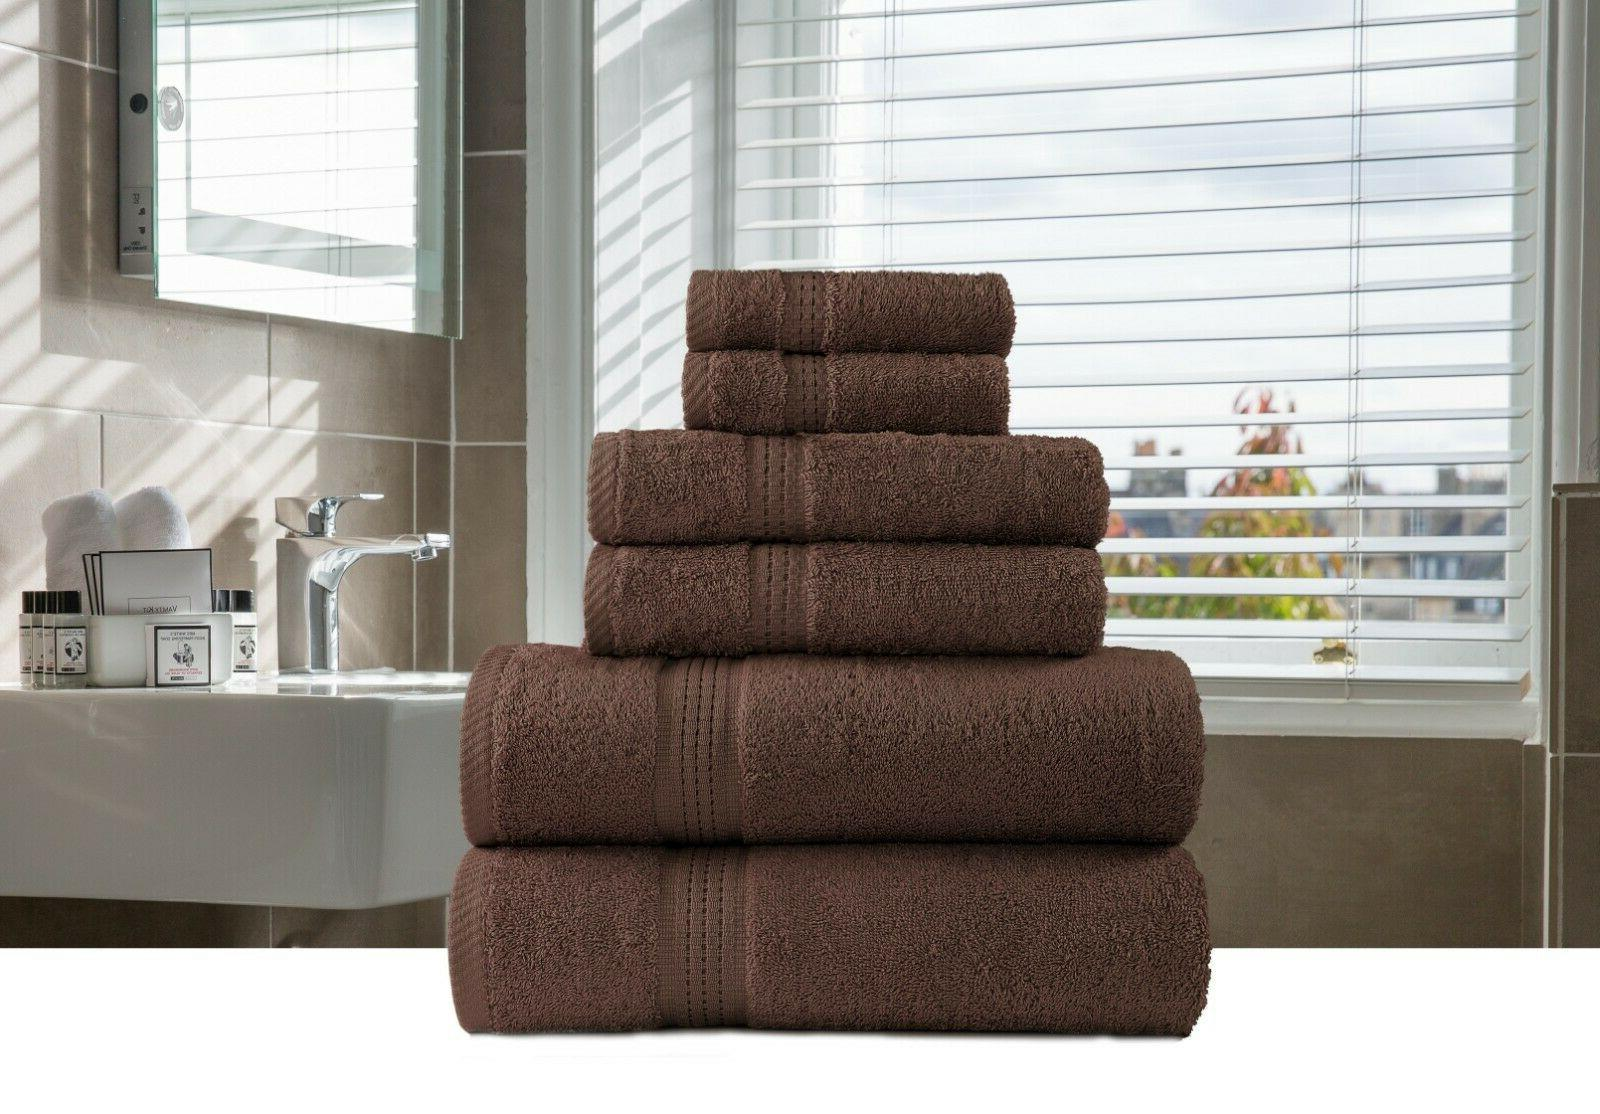 6-Piece Bath-Hand-Face Towels Sets 100% Organic Multi